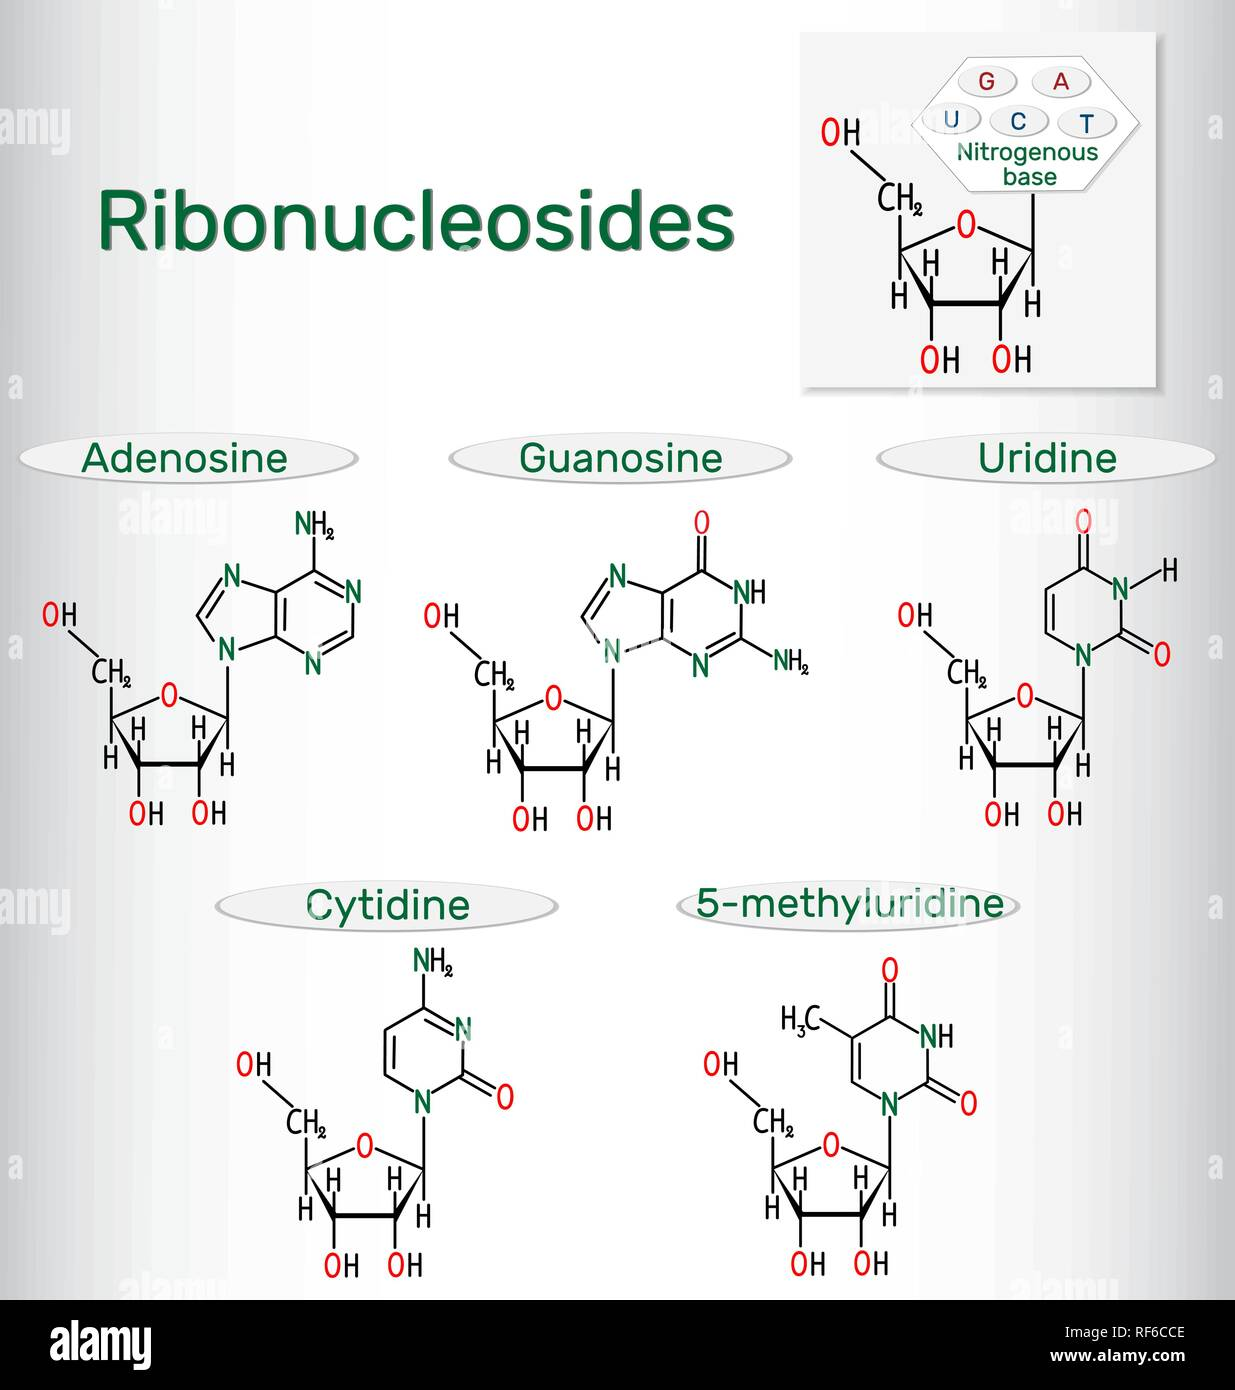 Ribonucleosides (adenosine, guanosine, cytidine, uridine, 5-methyluridine) - pyrimidine and purine nucleoside molecule. Structural chemical formulas.  - Stock Image